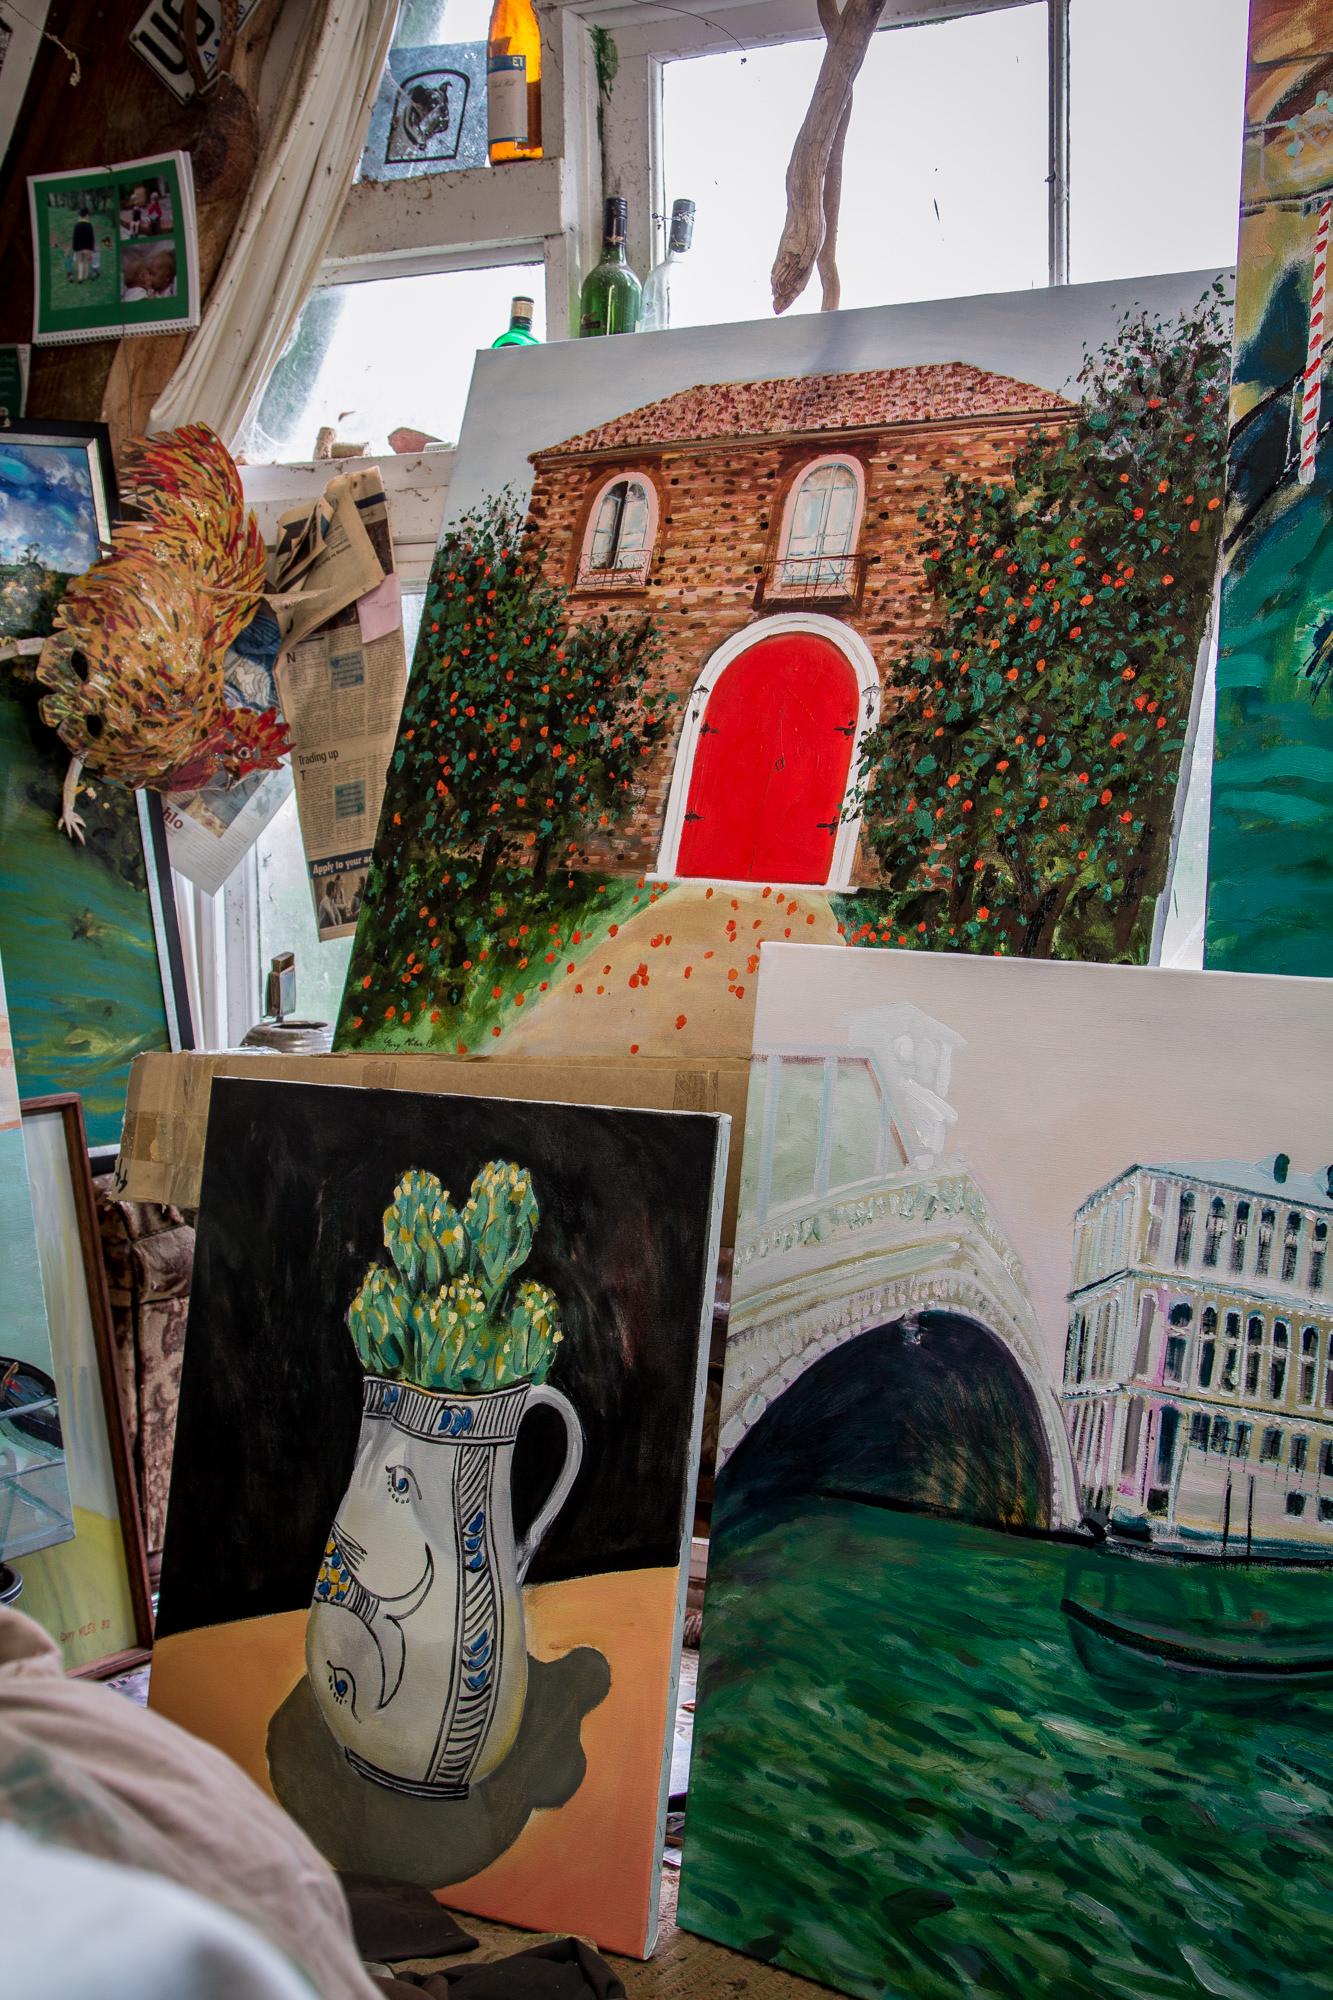 garymiles-ITALIA-Venice-Rome-Calabria-web-15.jpg